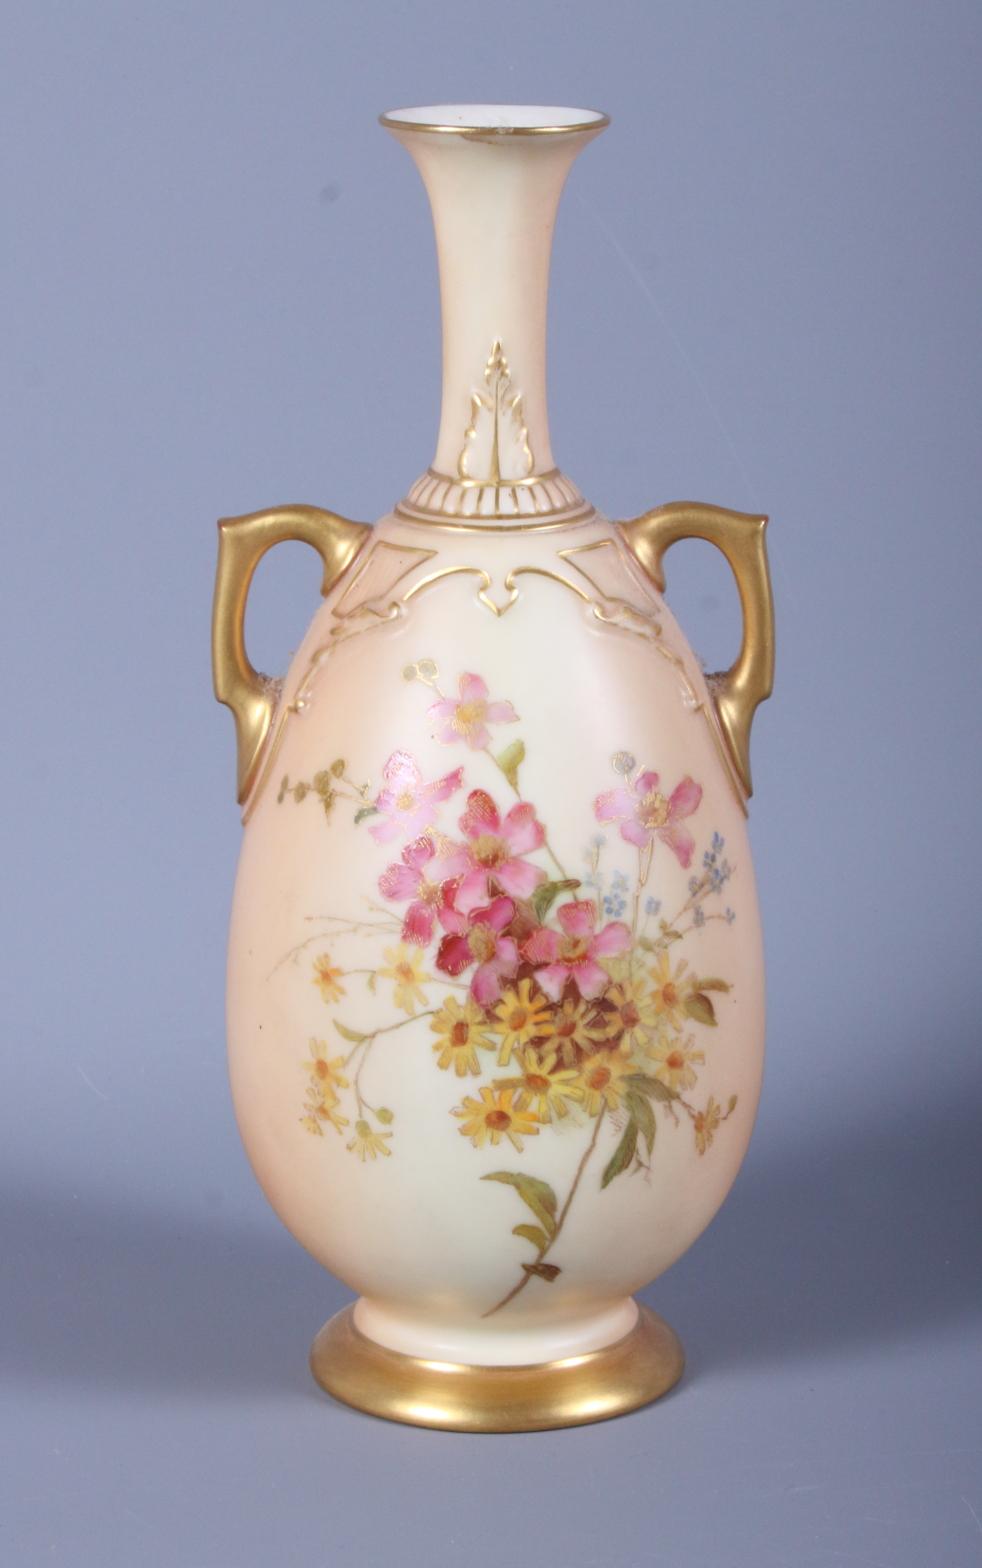 Lot 41 - A late Victorian Royal Worcester blush ivory two-handled porcelain vase, shape number 1762,